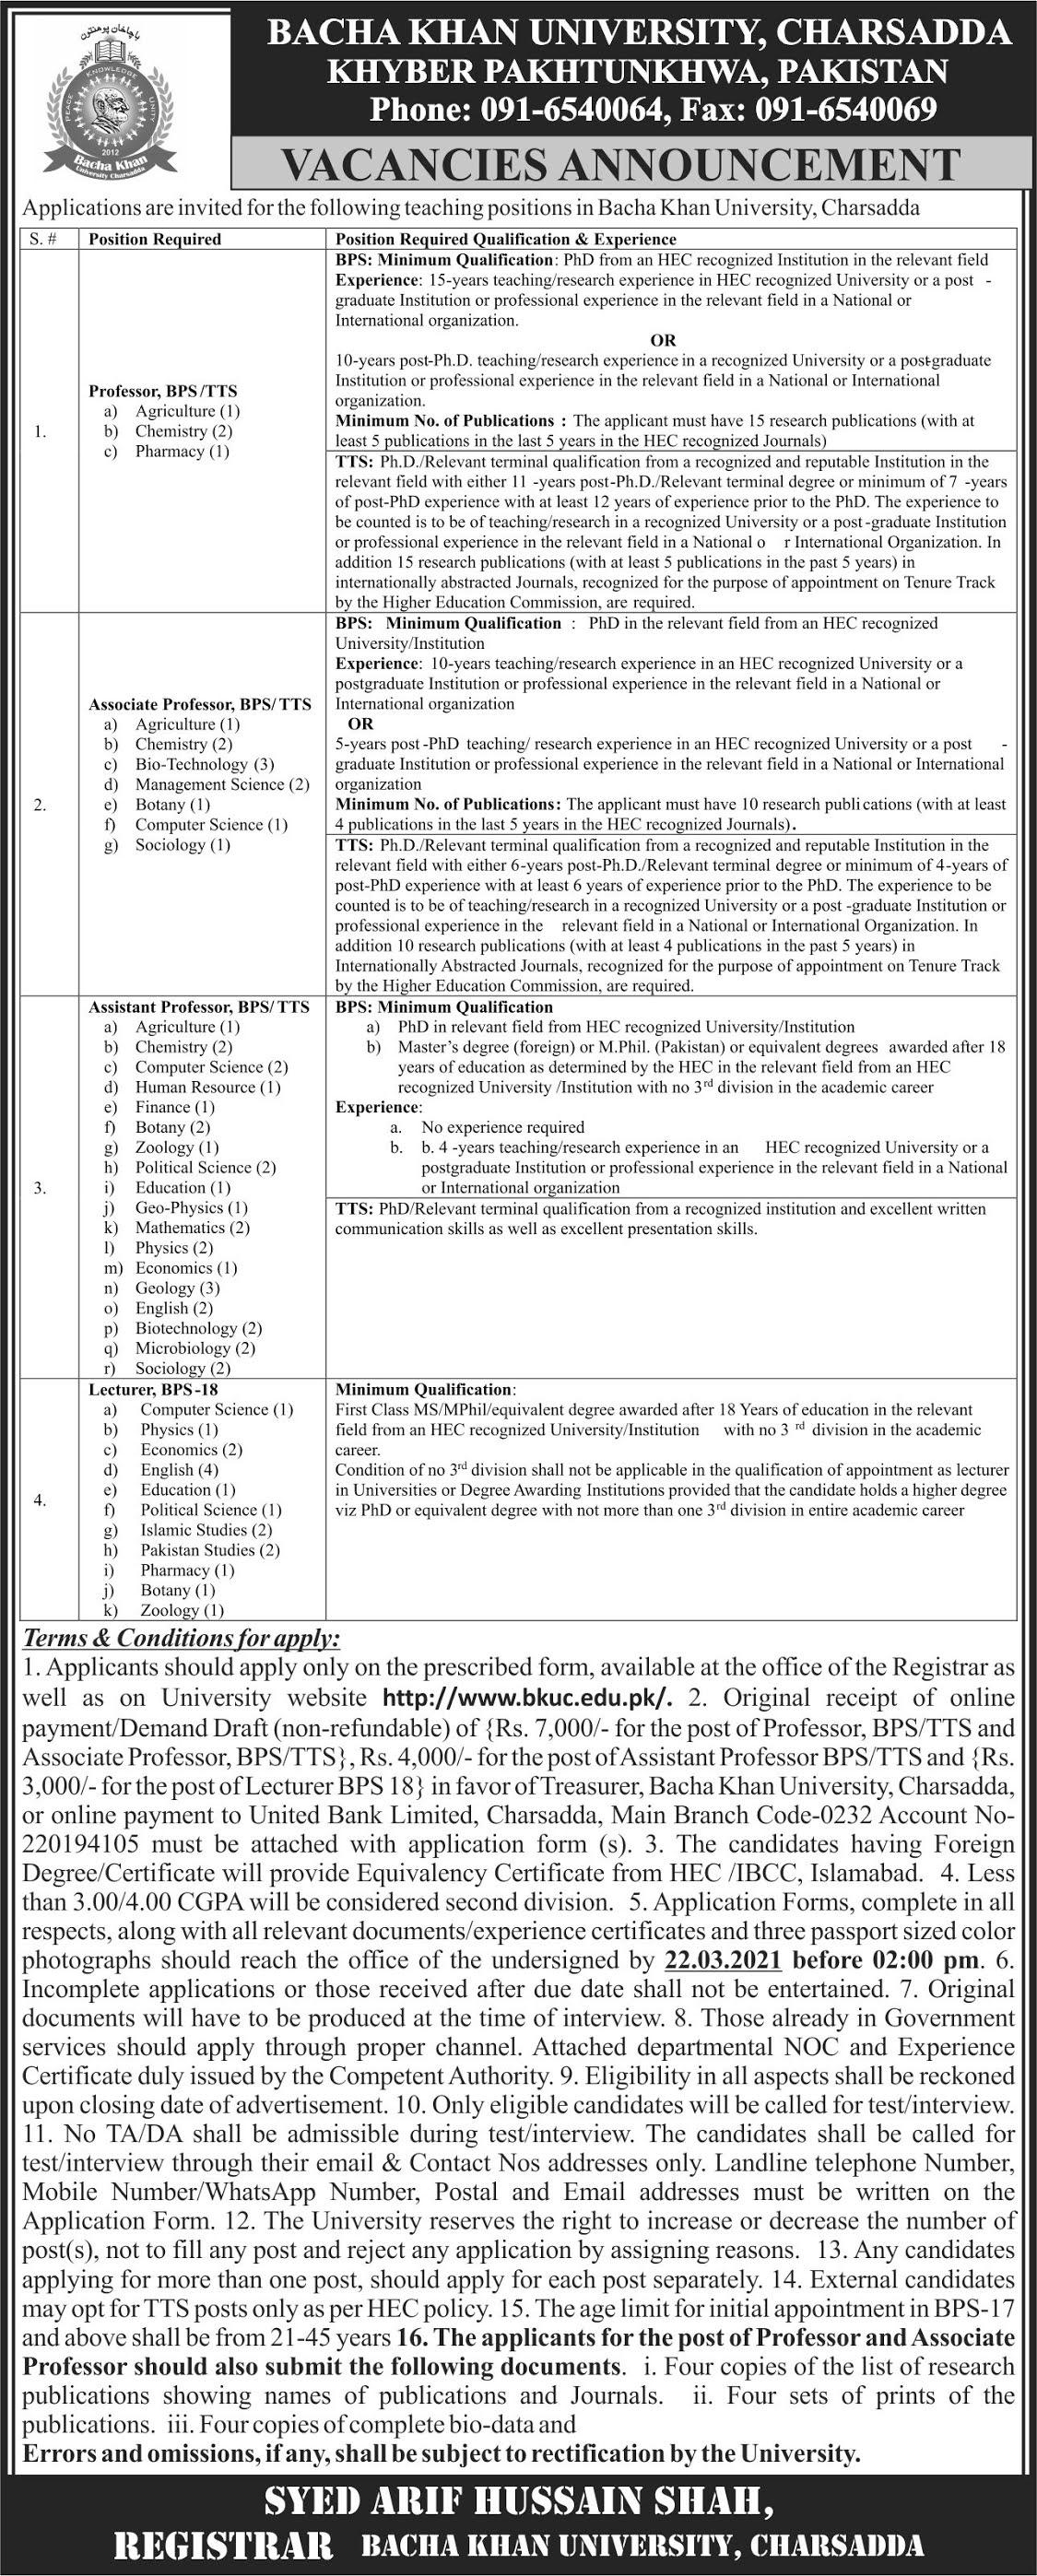 Bacha Khan University Charsadda BKUC Jobs 2021 For Teaching Staff